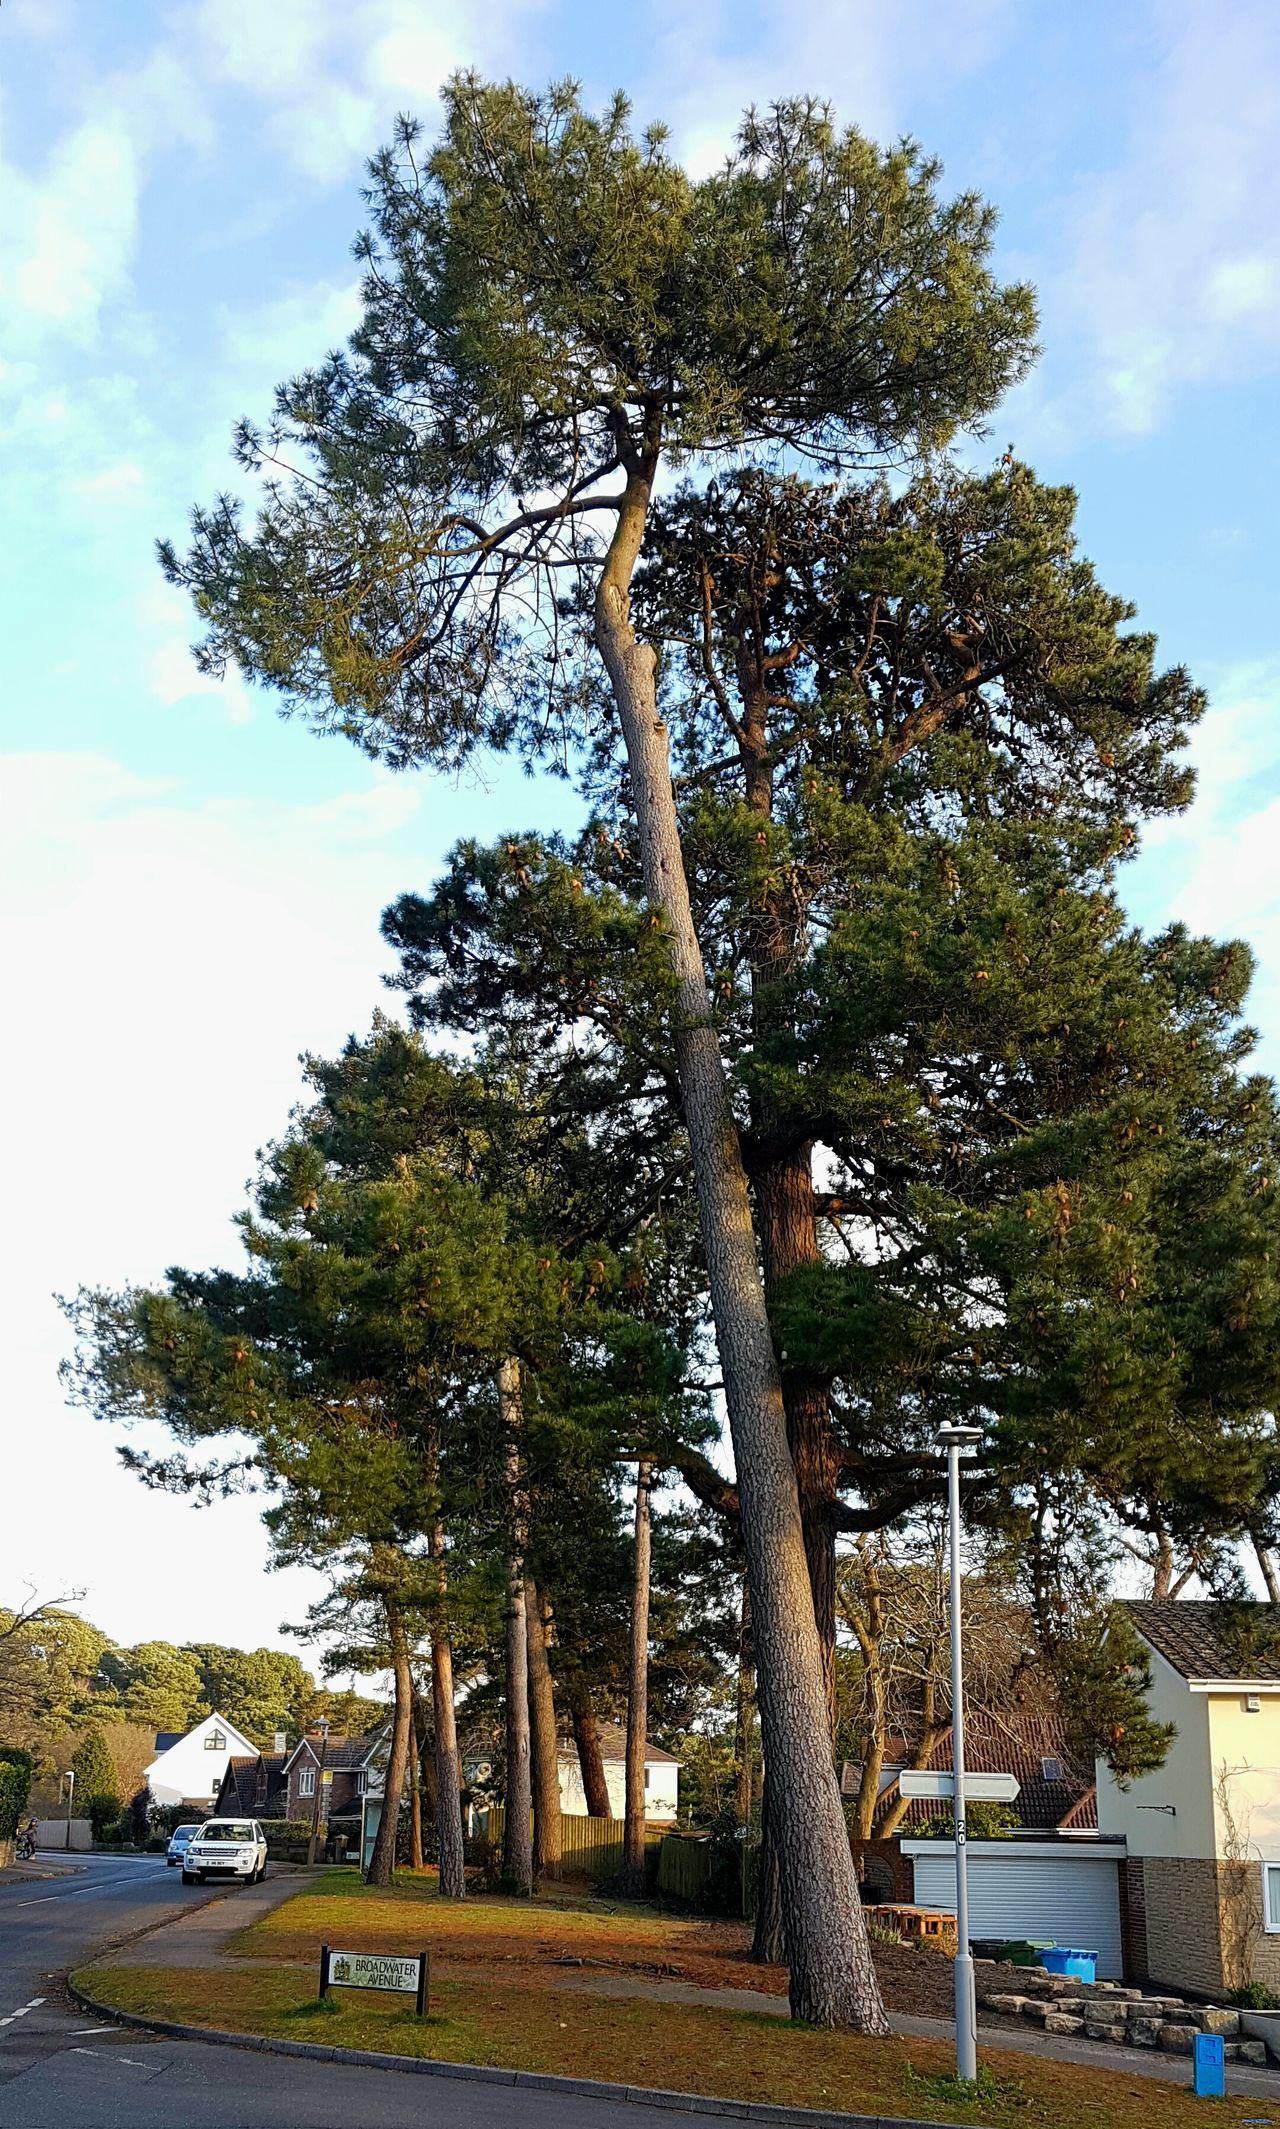 Street Trees Scots Pine Tree Pinus Sylvestris Residential Street Poole, Dorset England Conifers Quiet Street Tranquil Street Scene Trees Dwarf Homes Tall Slim Trees